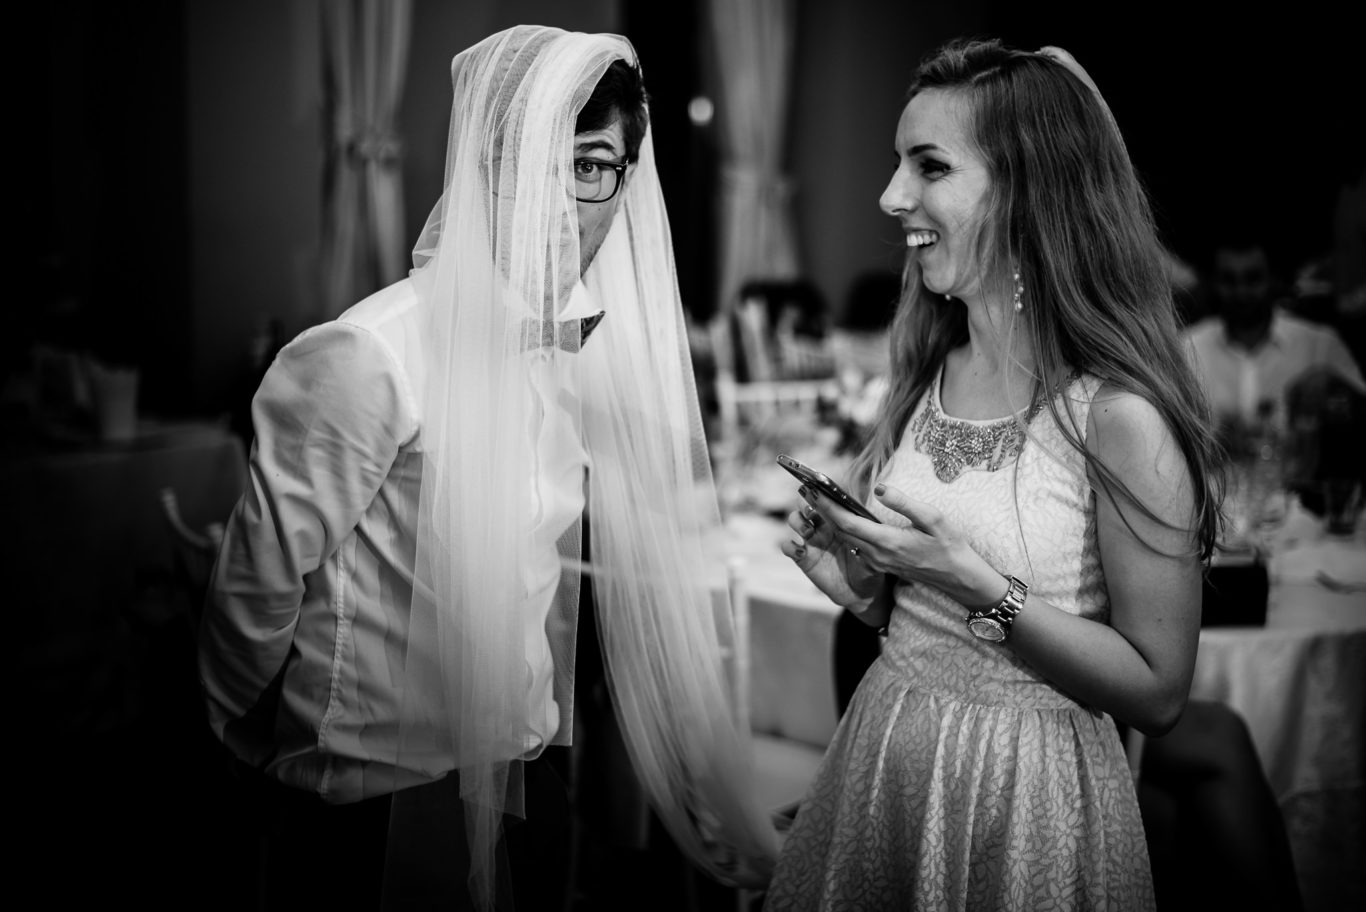 1004-Fotografie-nunta-Bucuresti-Oana-Catalin-fotograf-Ciprian-Dumitrescu-DSC_6246